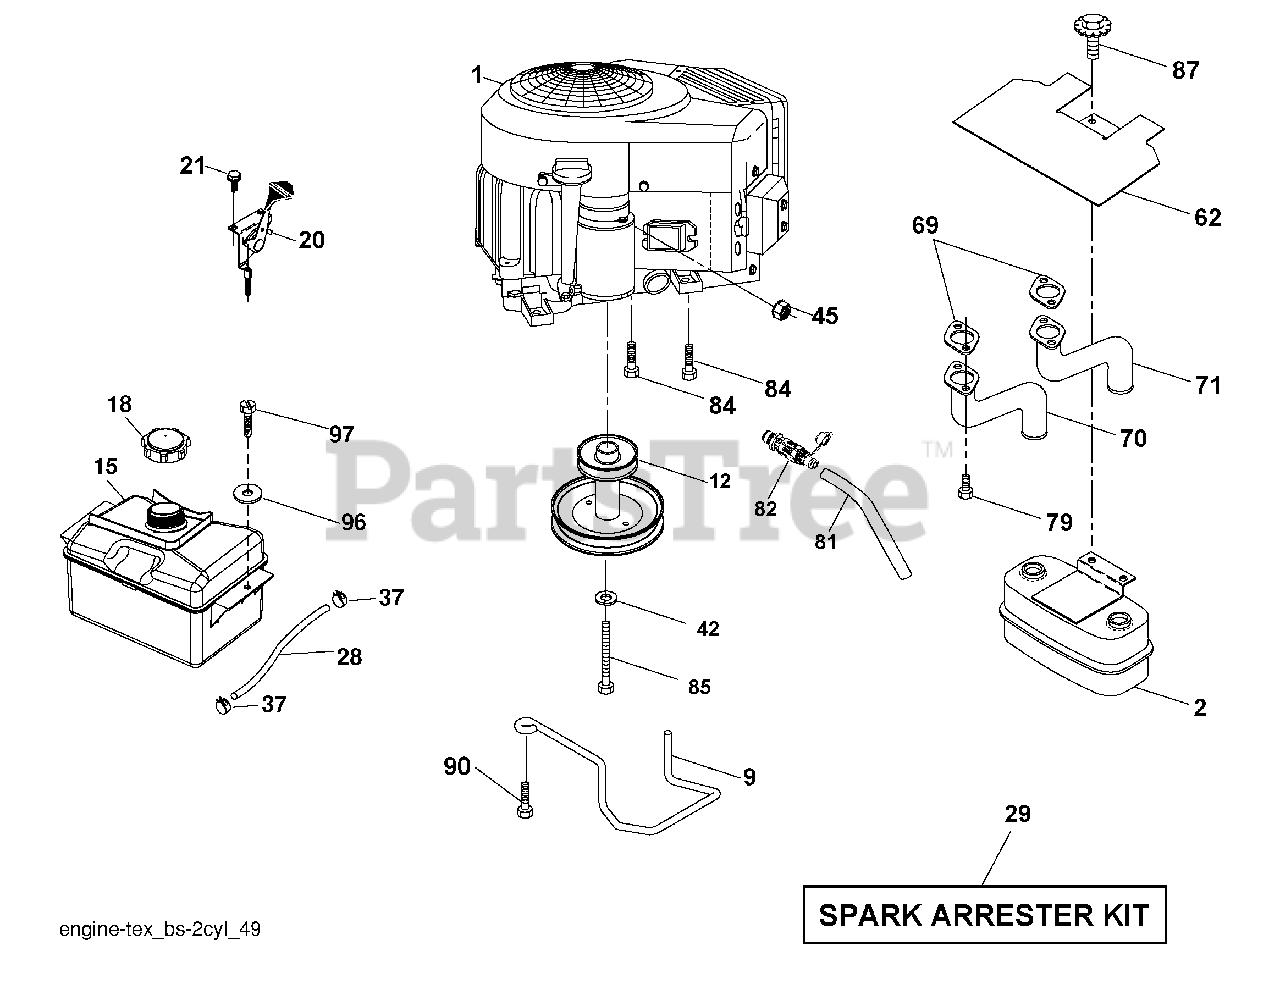 Husqvarna Parts On The Engine Diagram For Yth 22v46